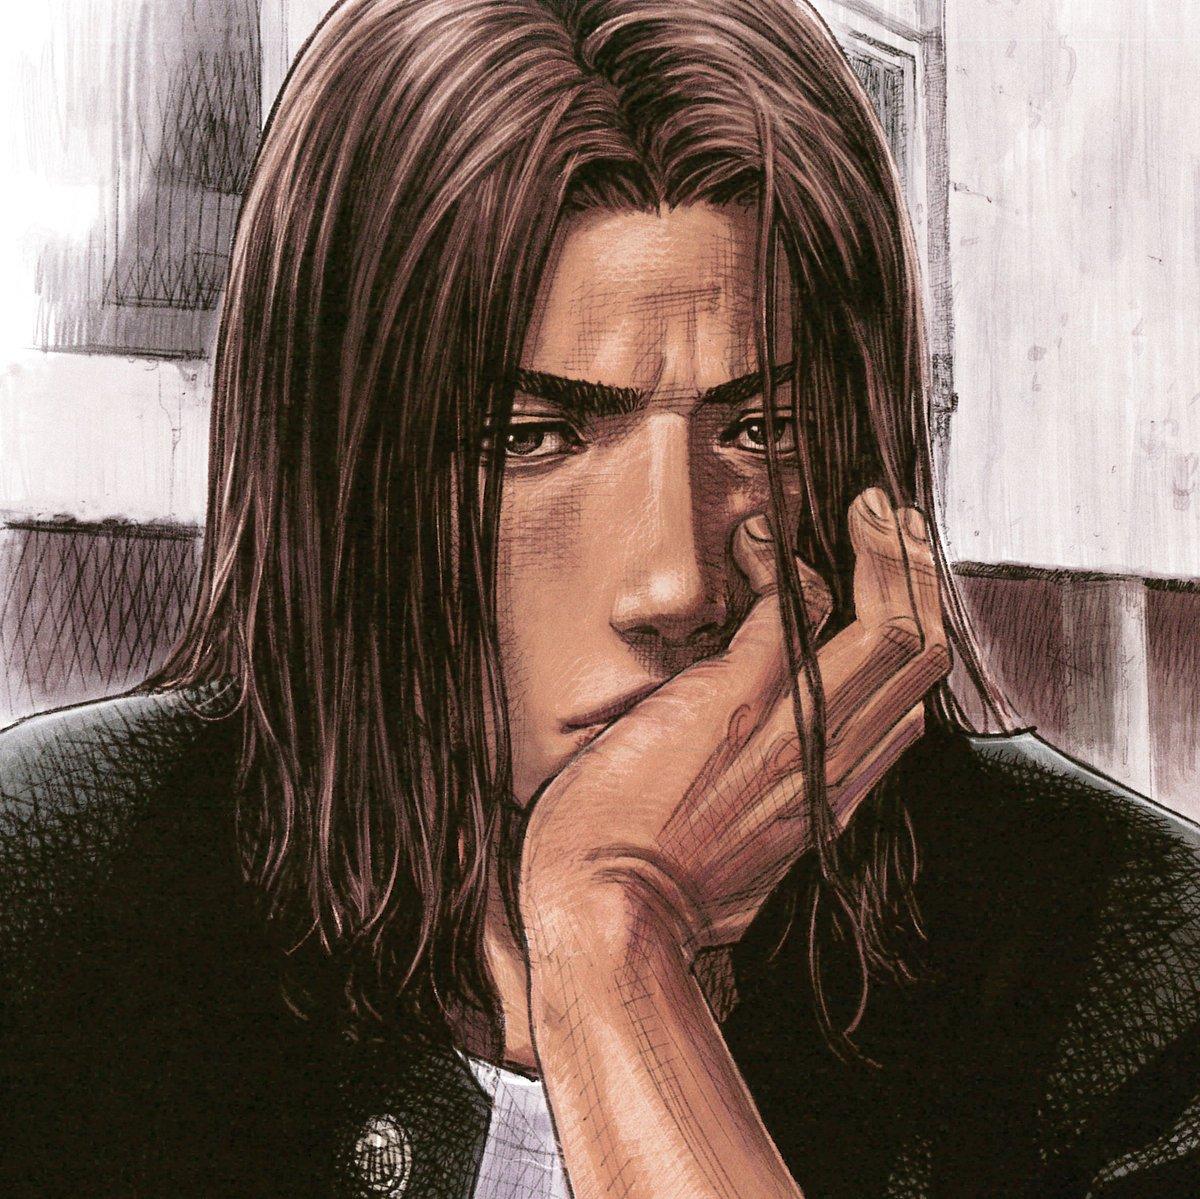 Let's just take a minute to appreciate Takehiko INOUE's art.